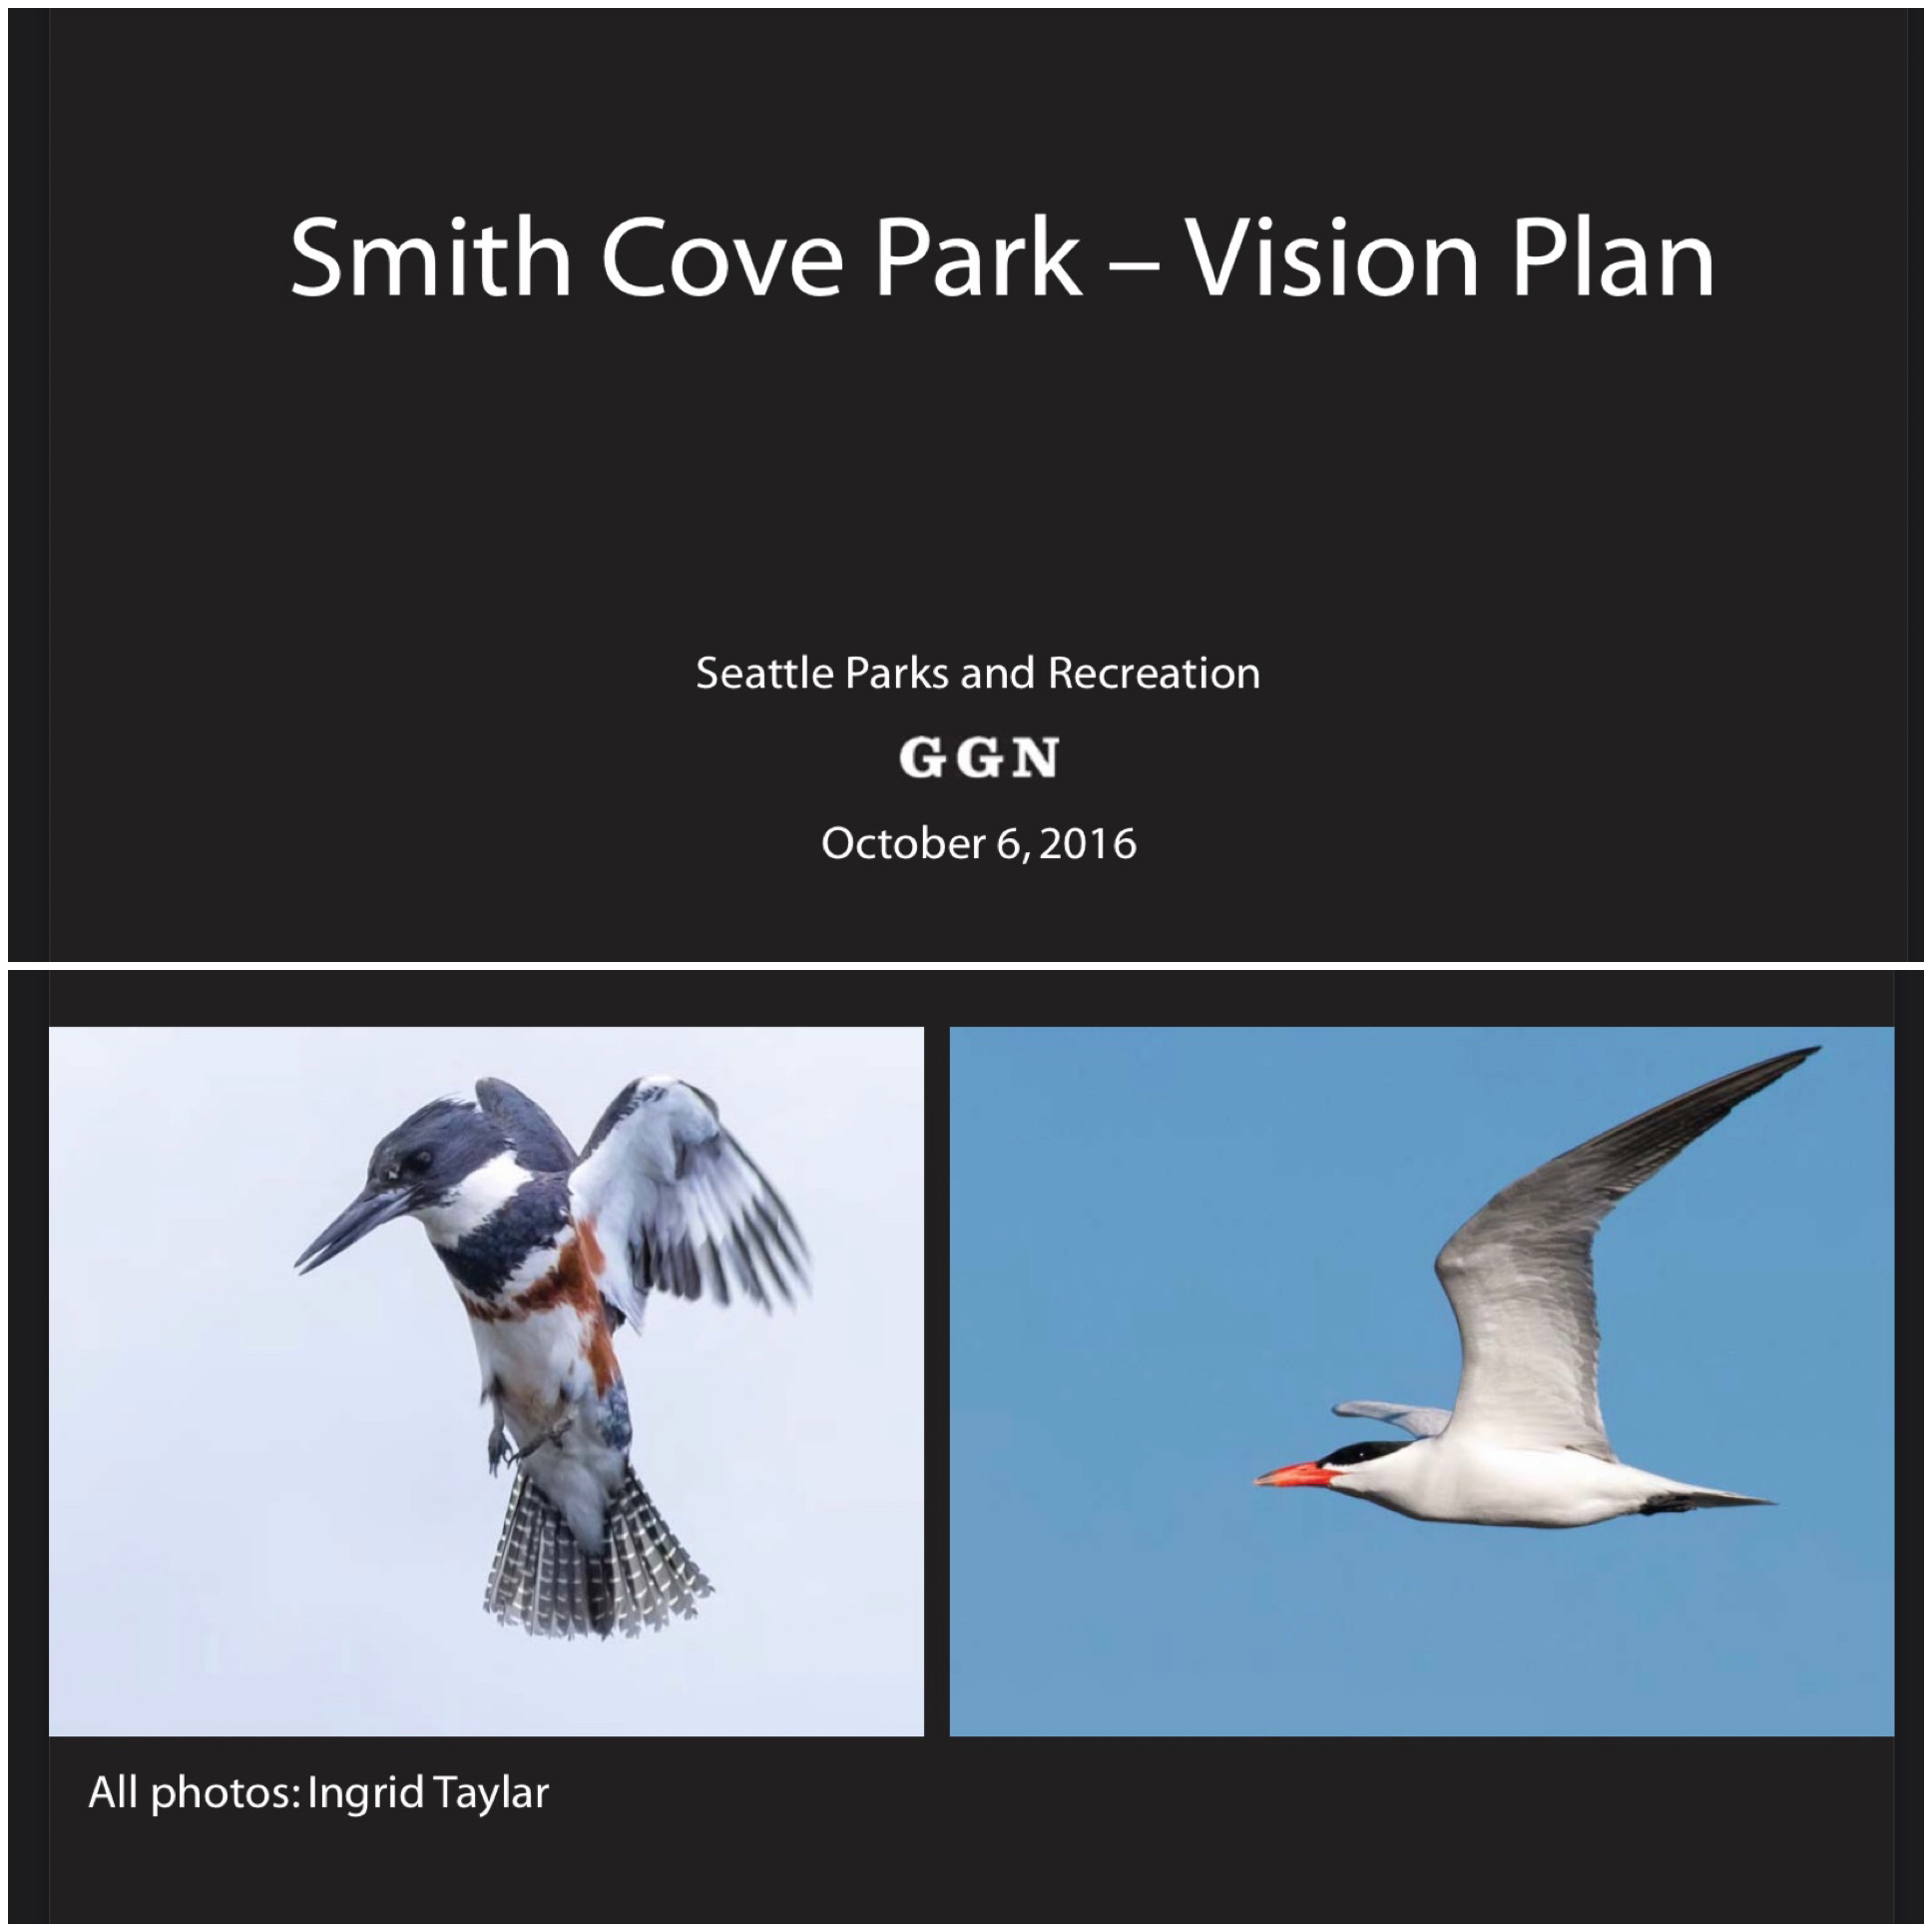 Smith Cove Park Vision Plan